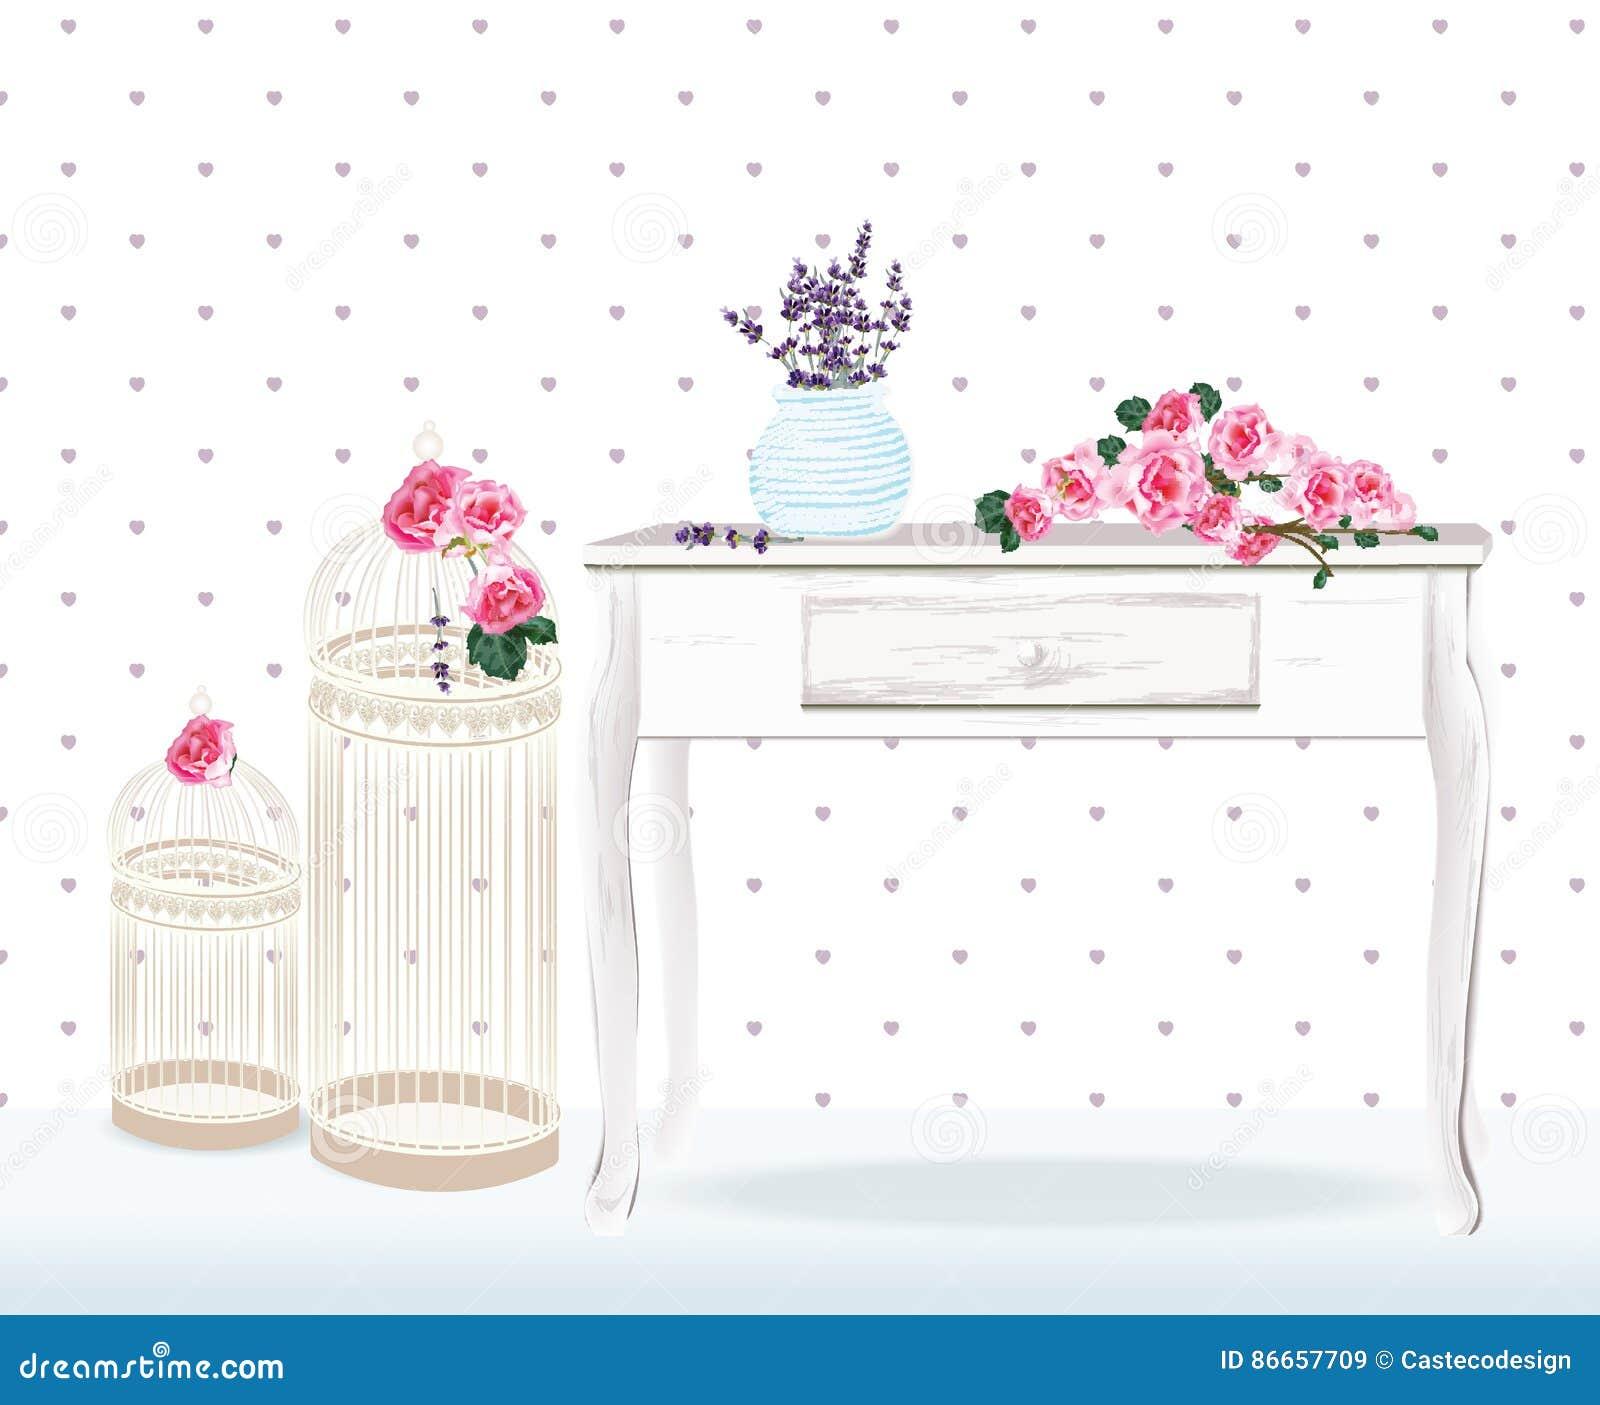 Retro Style Floral Decorations For Wedding Birthday Invitation